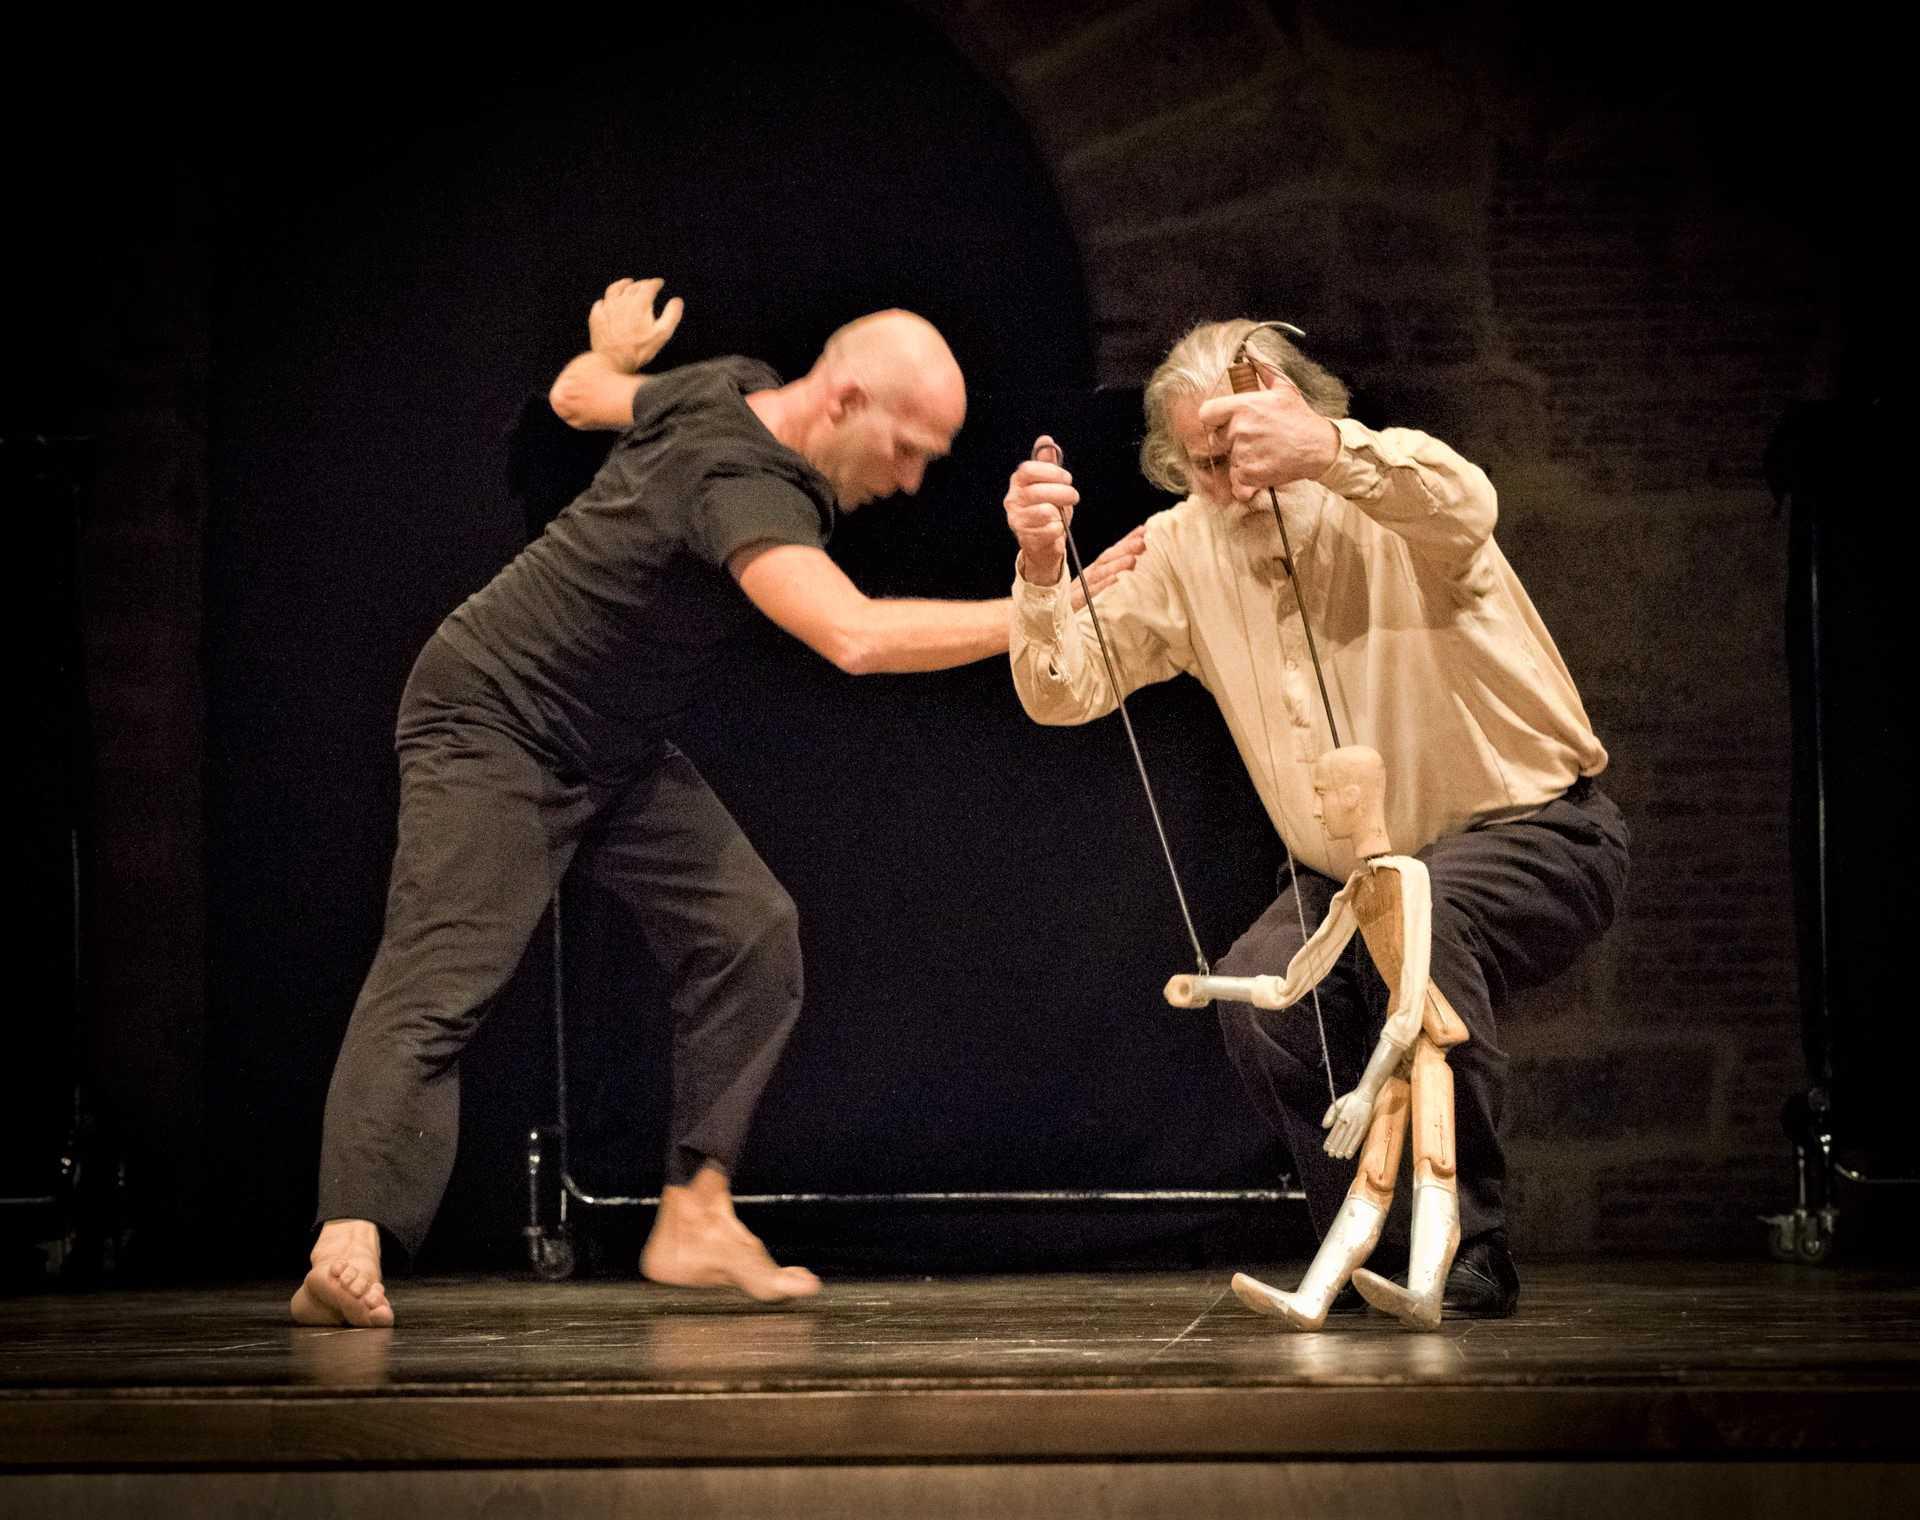 Virgilio Sieni & Mimmo Cuticchio Atlante_Vangelo#1. Foto di scena ©Alessandro D'Amico